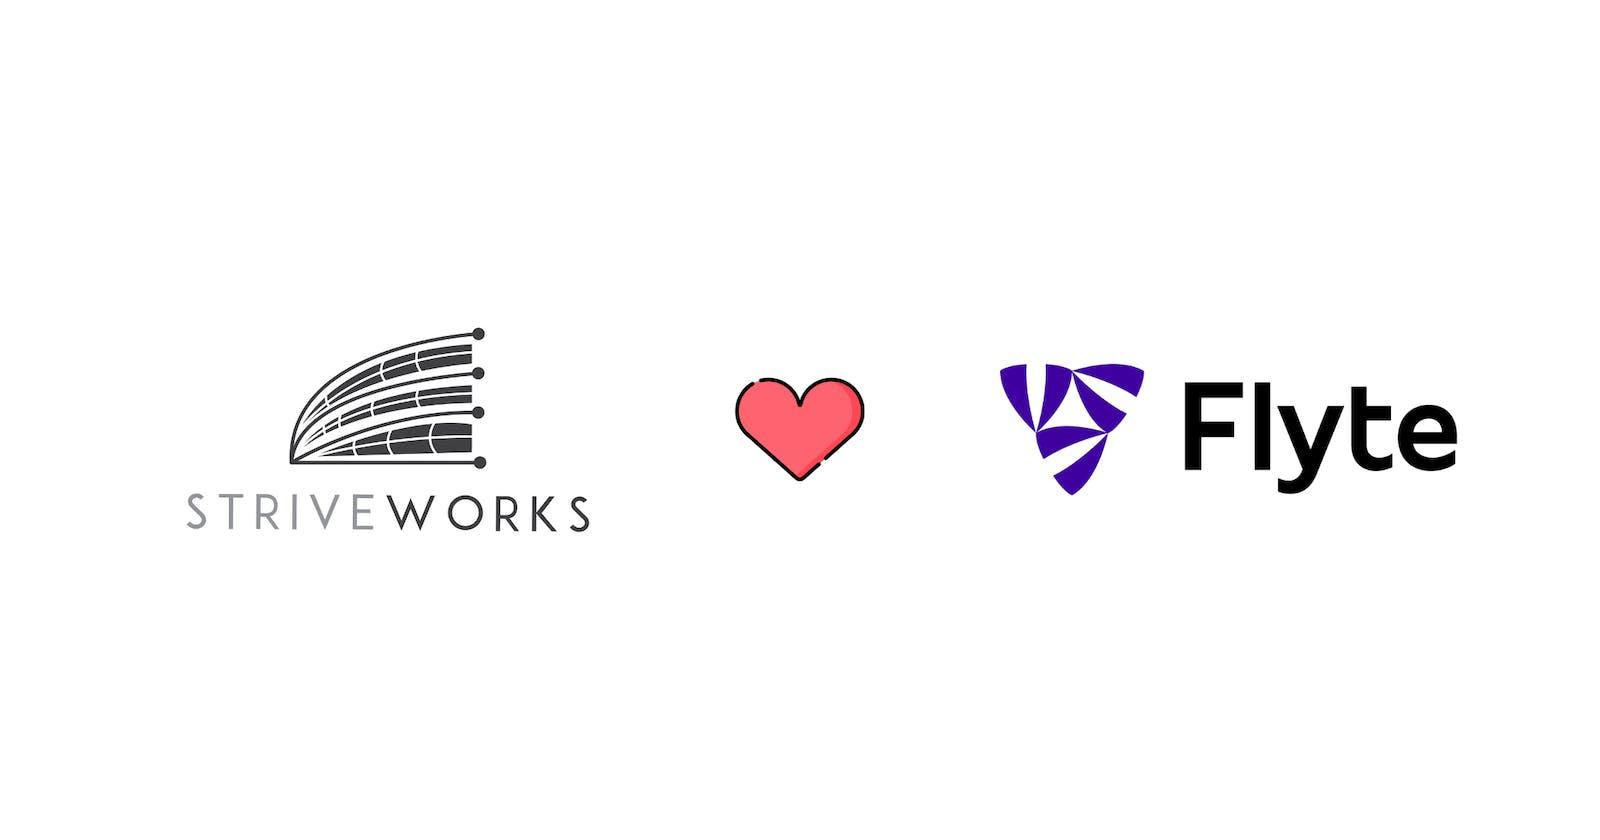 Using Flyte to Power MLOps at Striveworks